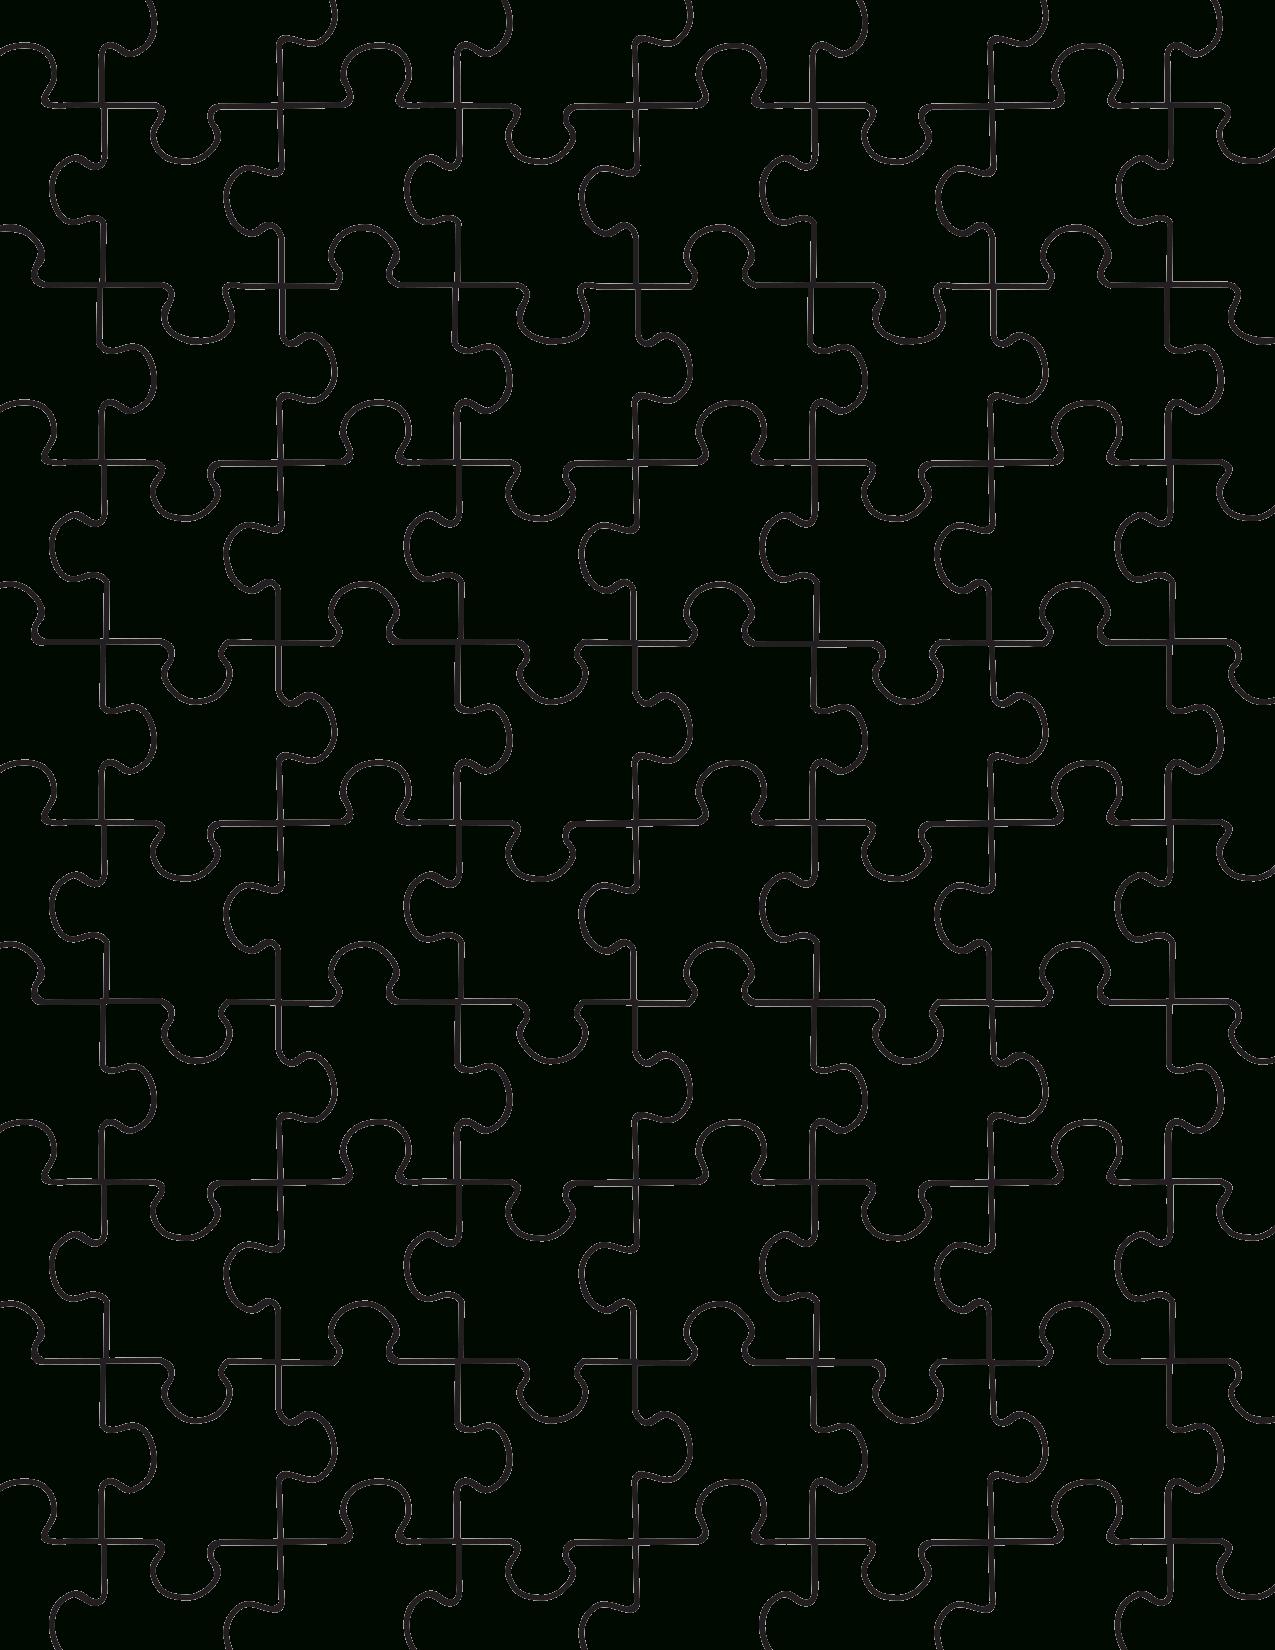 Printable Puzzle Pieces Template   Lovetoknow - Printable Puzzle Pictures